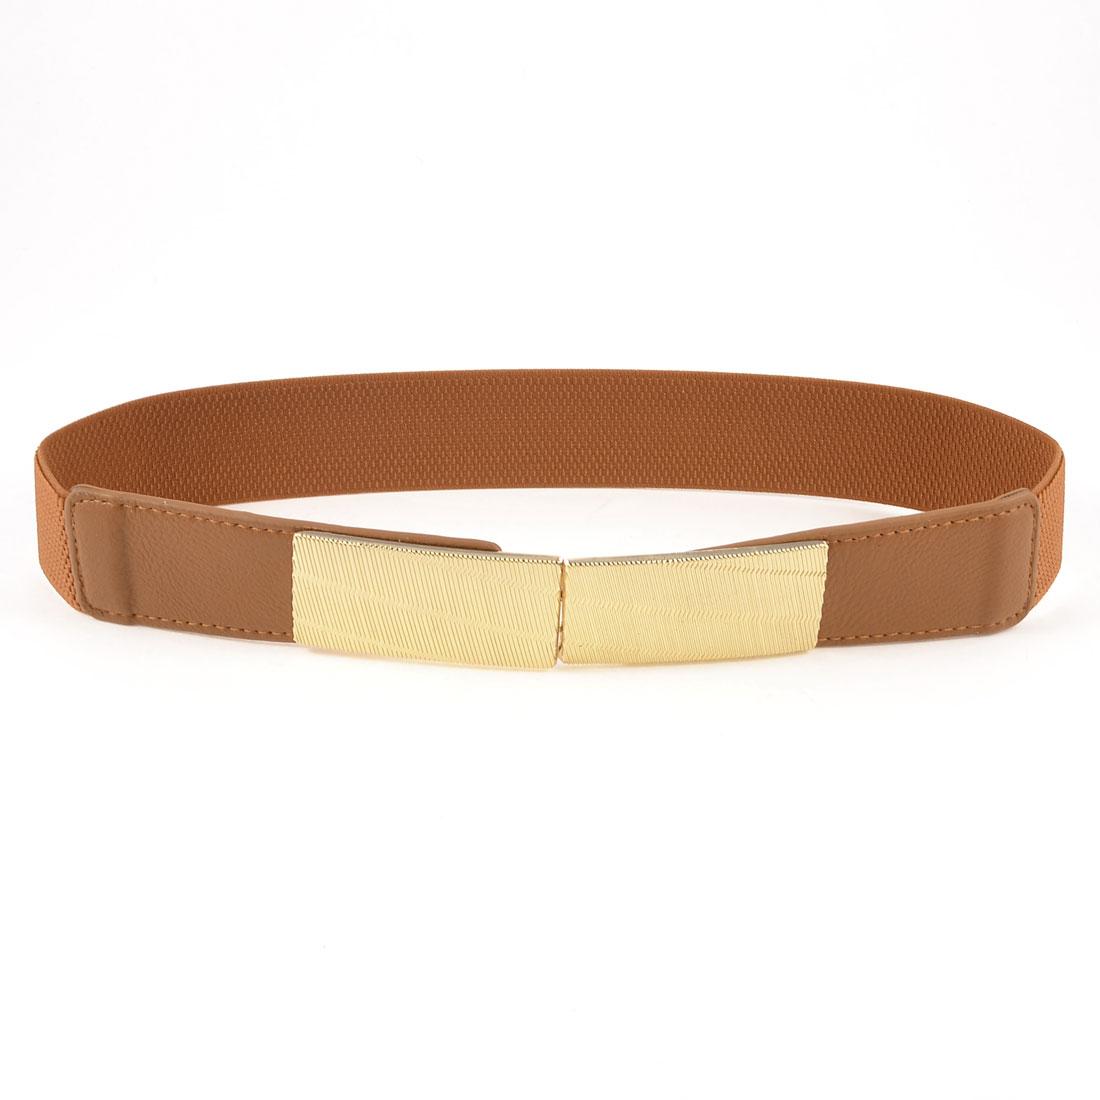 Lady Metallic Interlock Hook Buckle Stretchy Waist Band Belt Brown